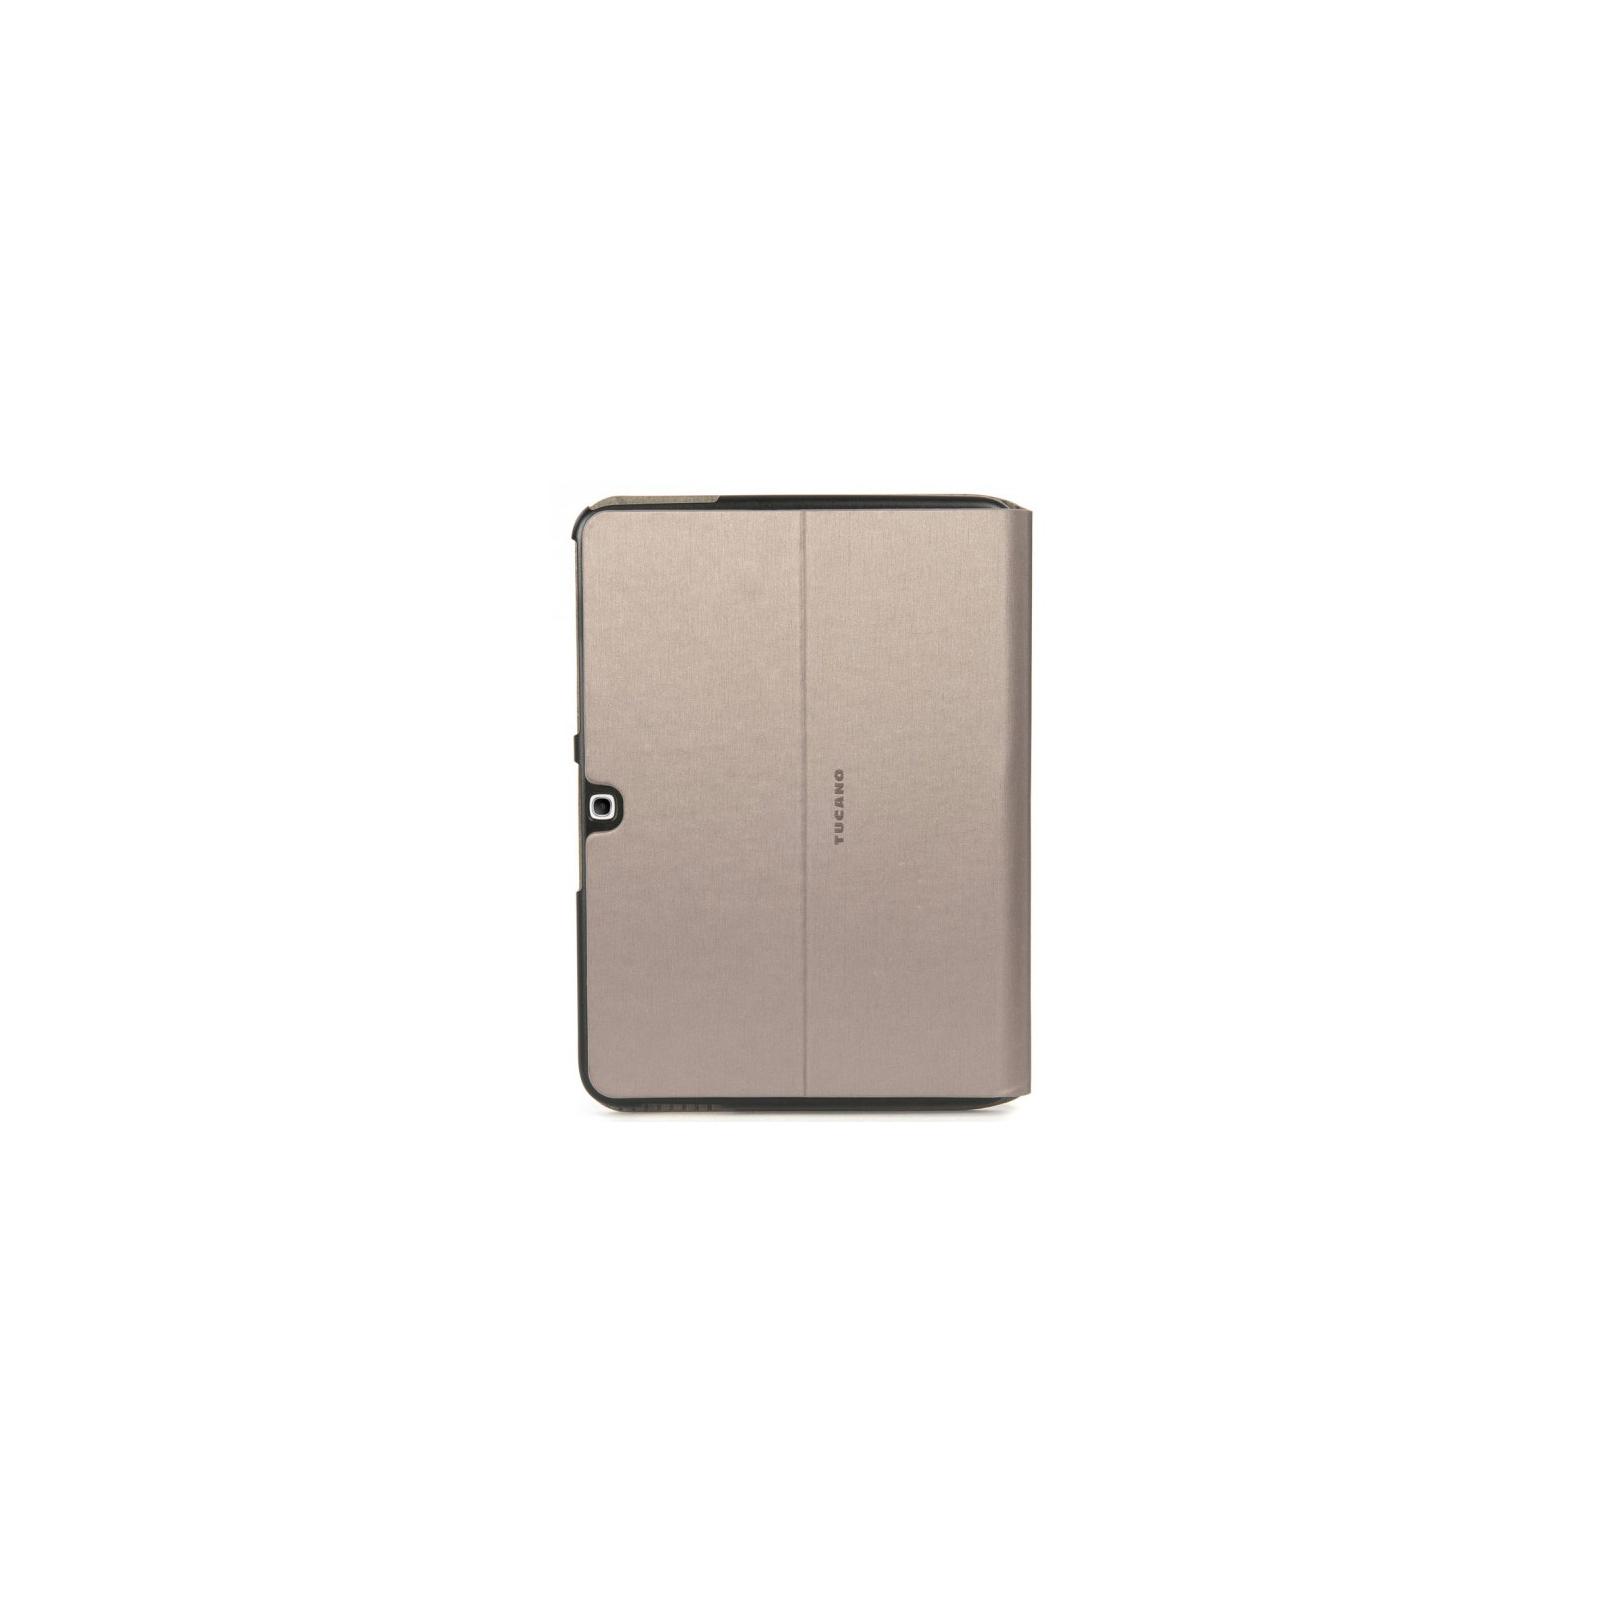 Чехол для планшета Tucano Galaxy Tab3 10.1 Macro (TAB-MS310-G) изображение 2